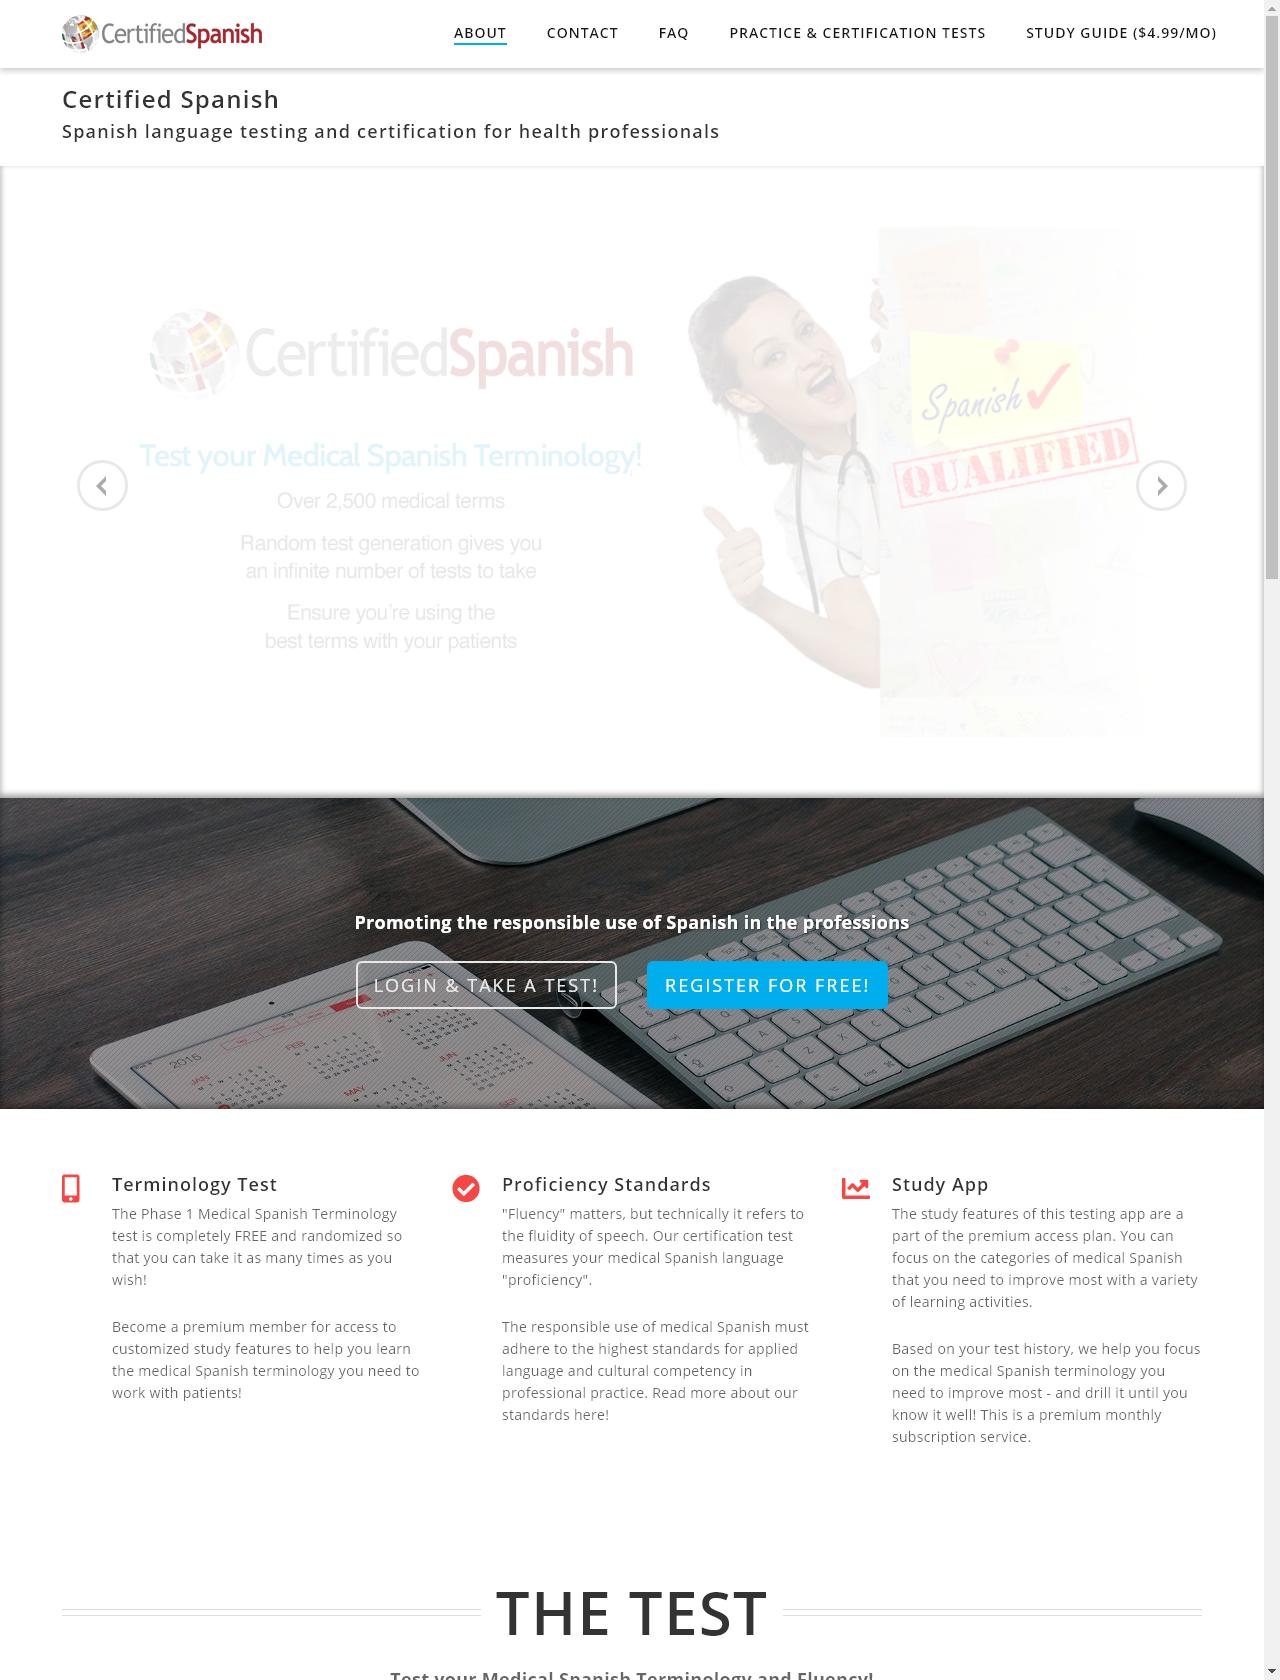 Screenshot Desktop - https://certifiedspanish.com/